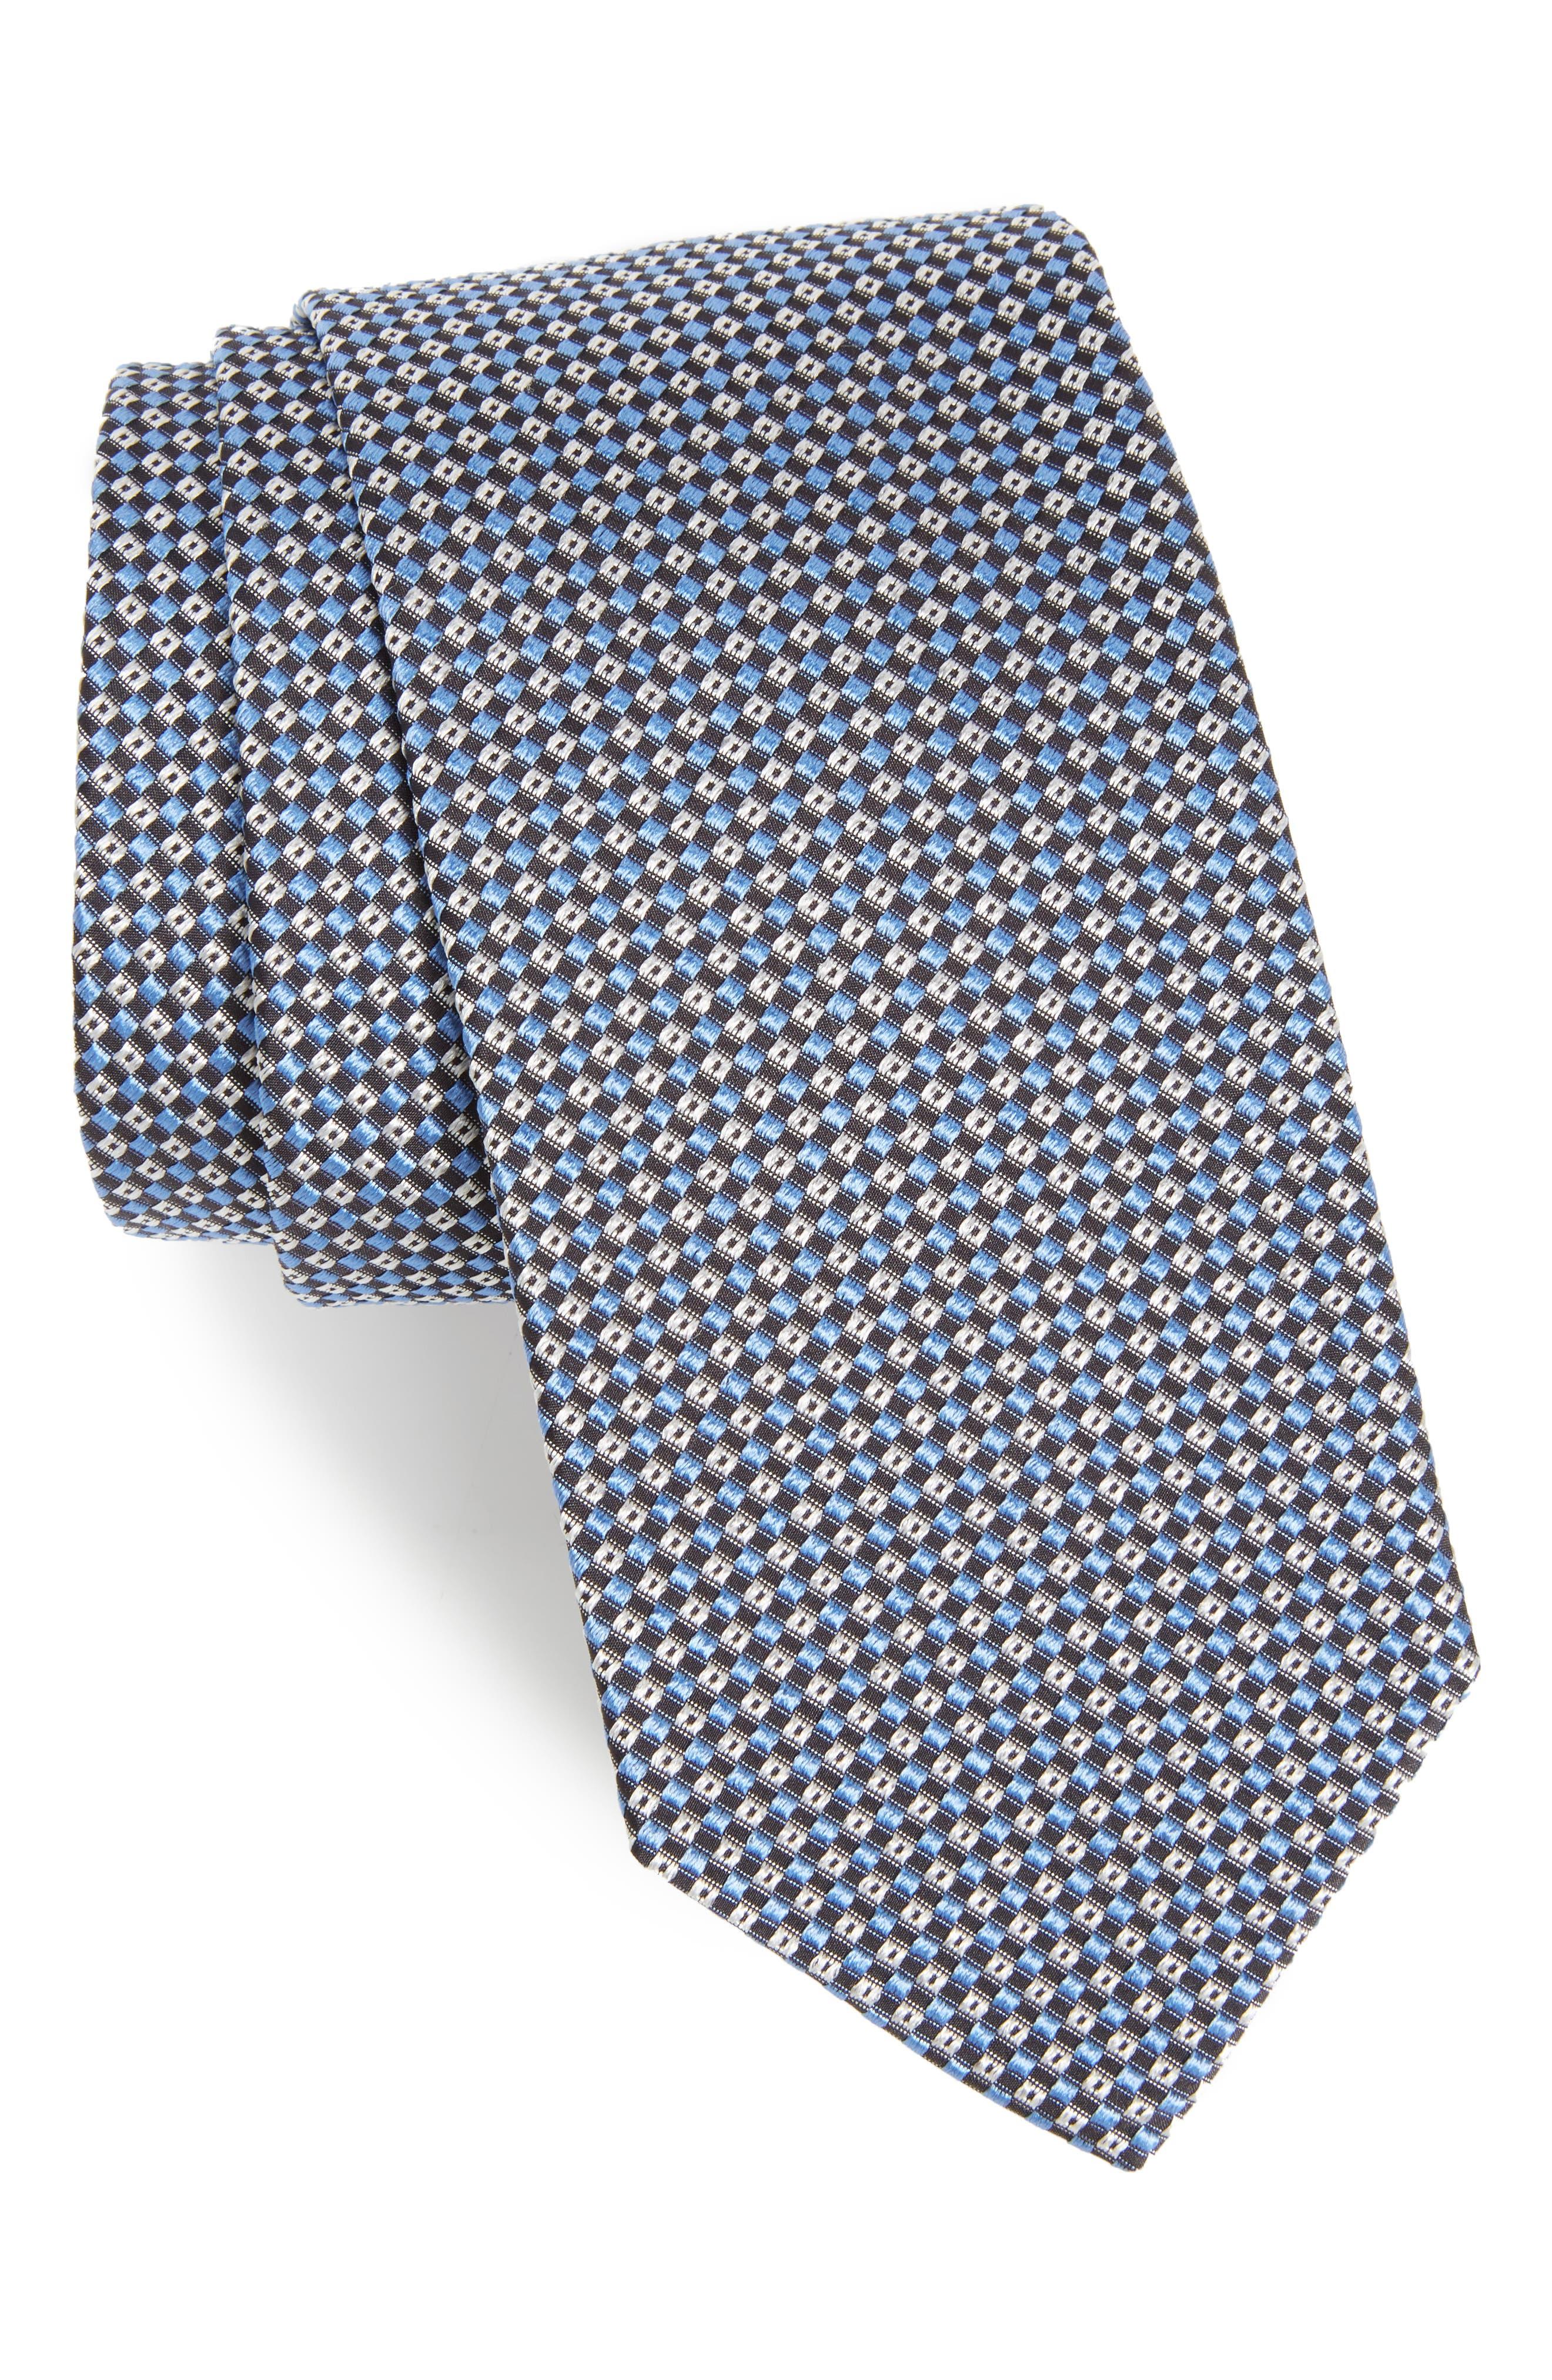 Alternate Image 1 Selected - BOSS Geometric Silk Tie